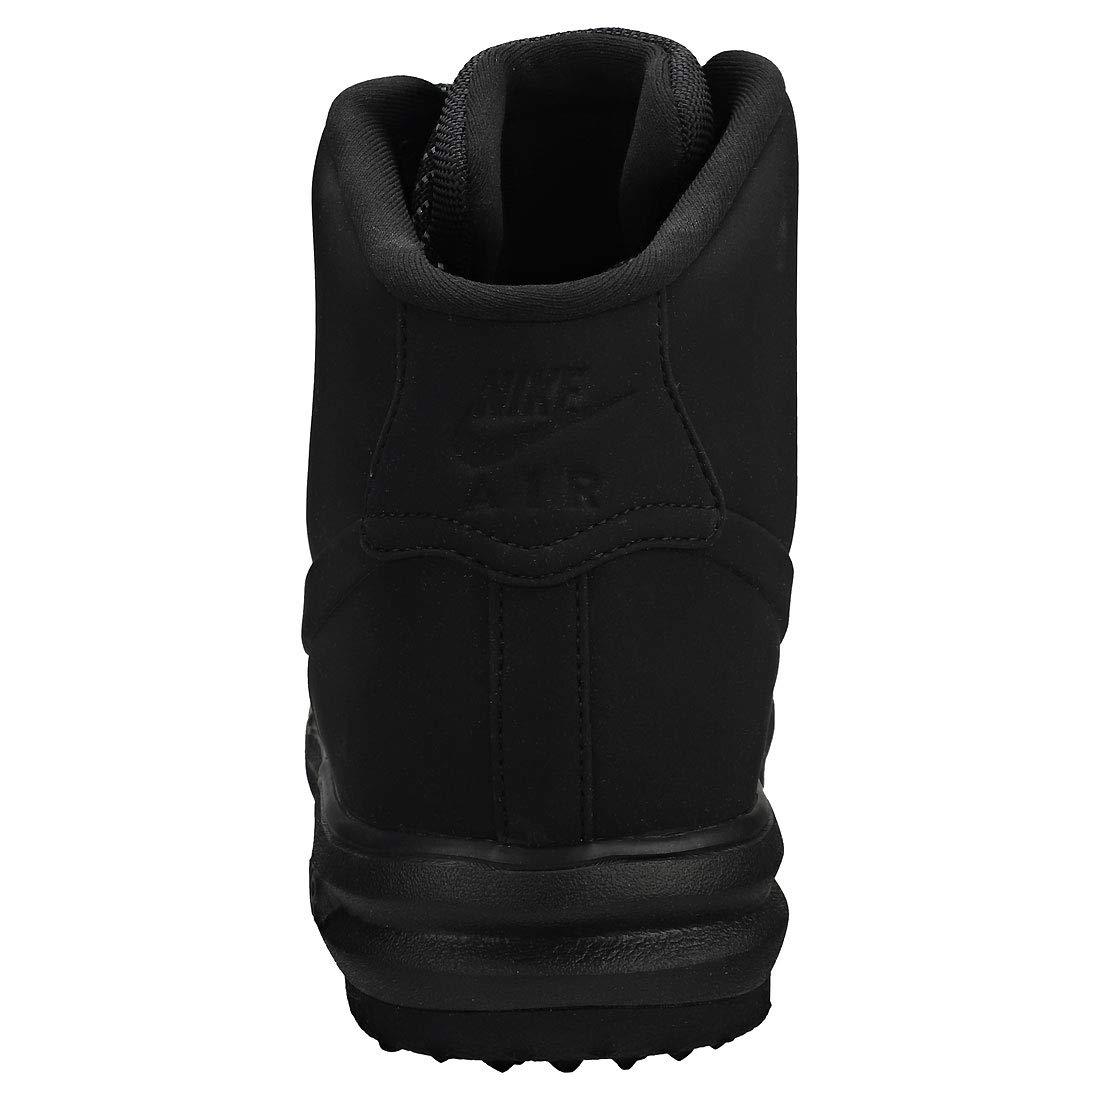 buy online 50278 a9cfc Amazon.com   Nike Lunar Force 1 Duckboot  18 Mens Bq7930-003   Shoes